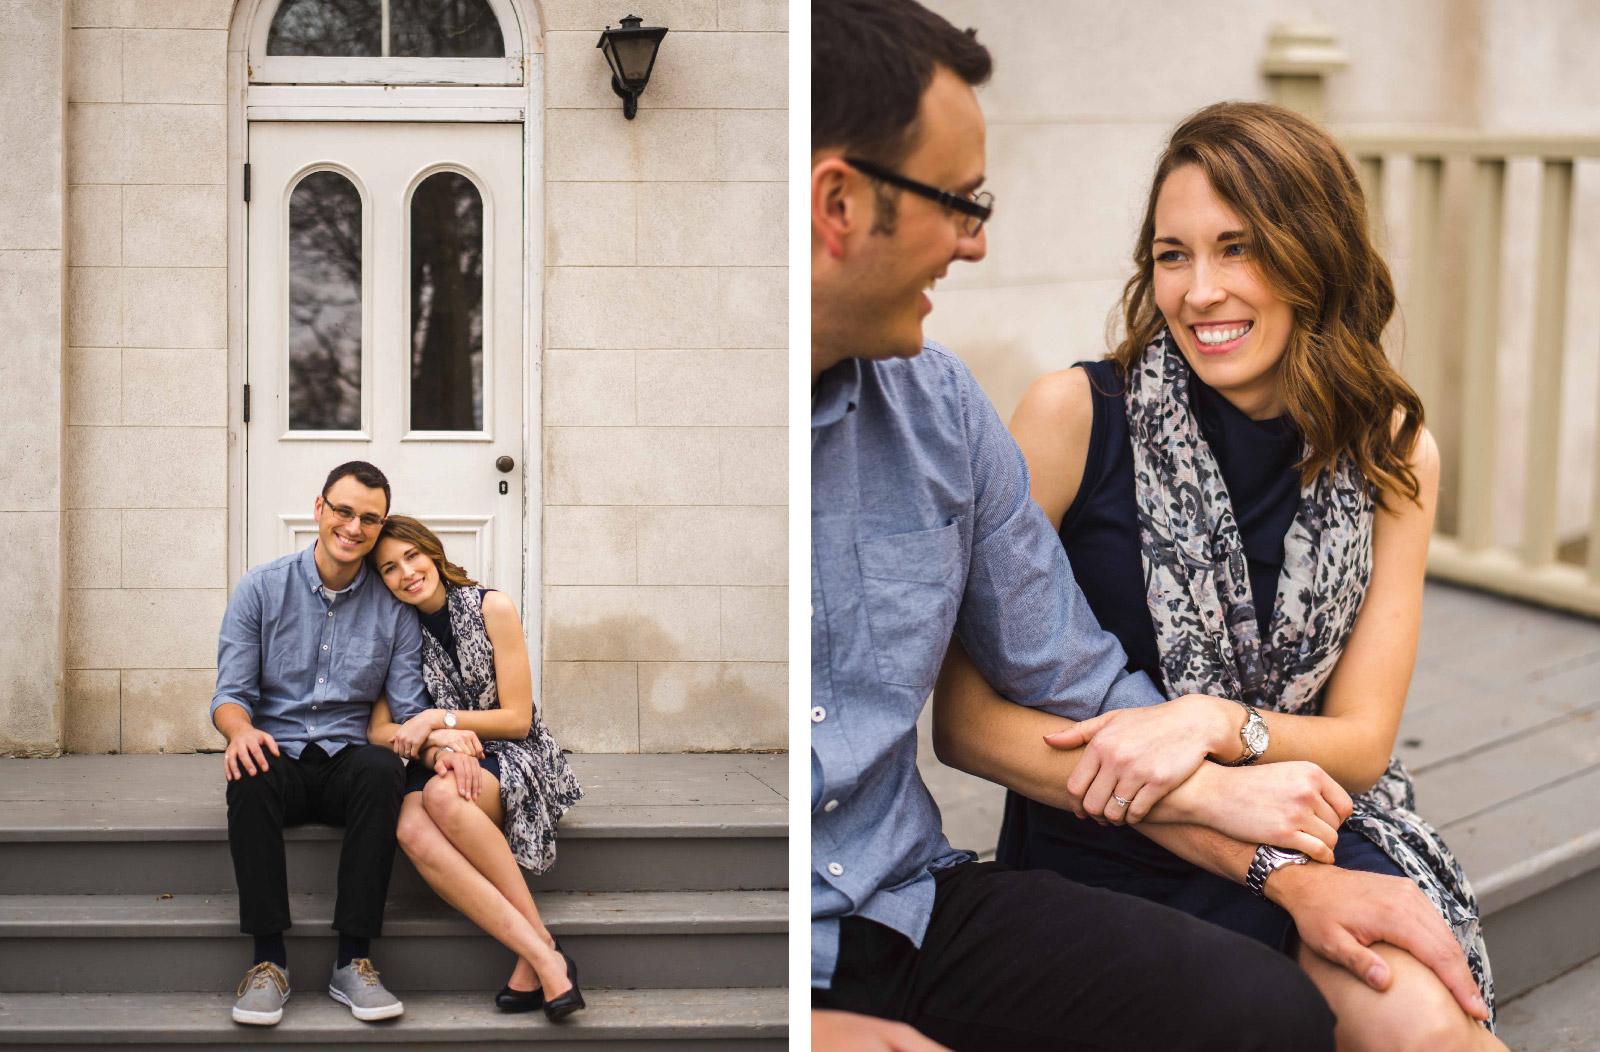 Dana and Marcus Cute Stairs Hush Hush Photography & Film Aidan Hennebry Hamilton Wedding Photographer Videographer-01.jpg